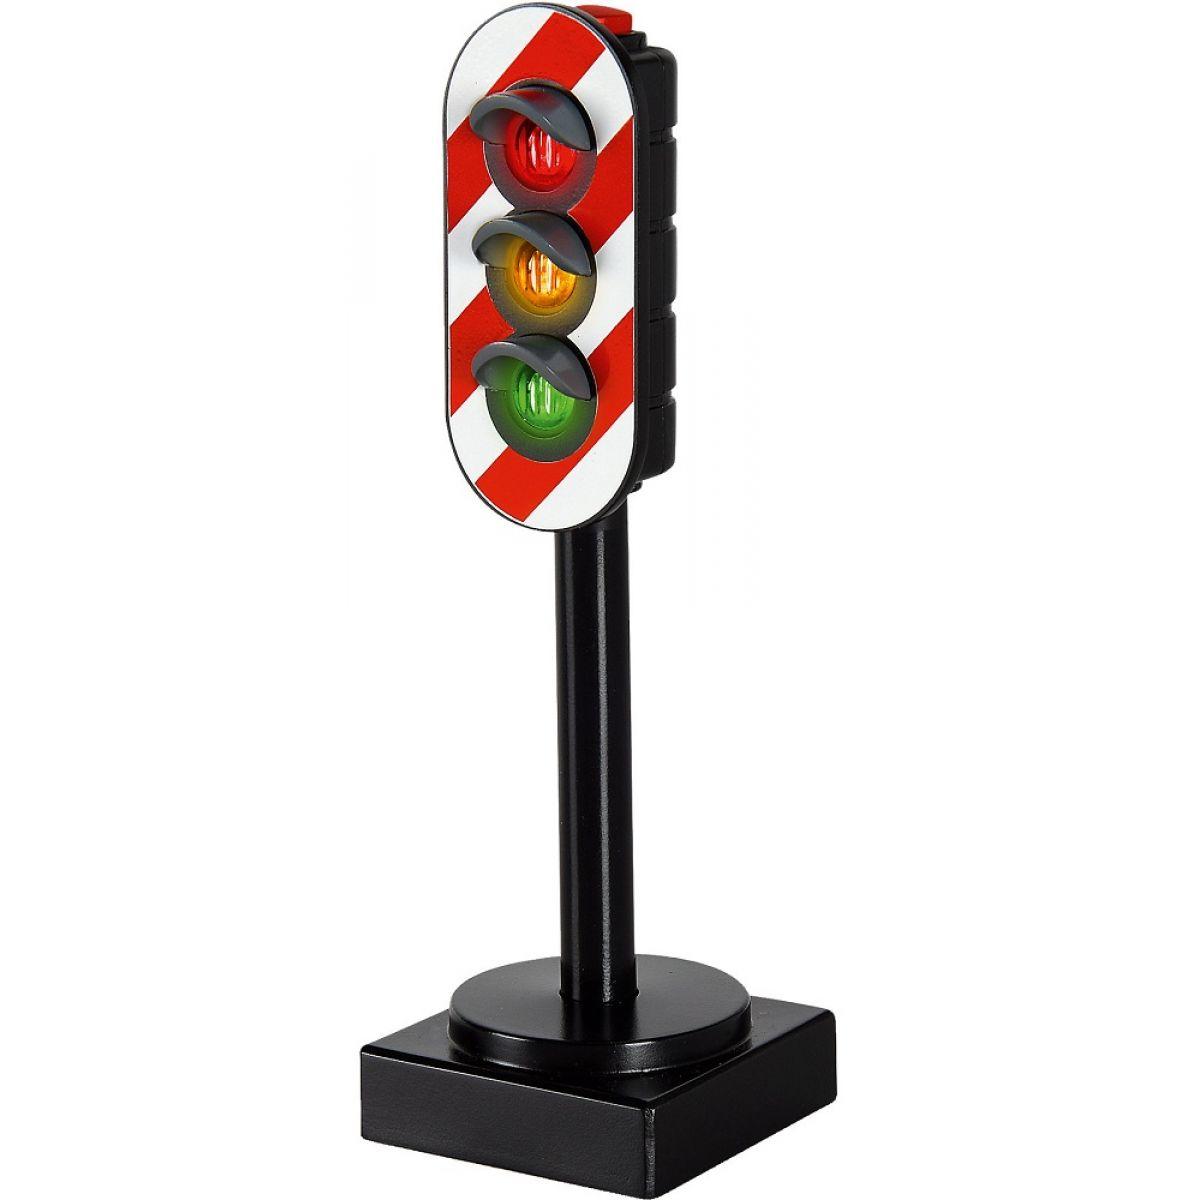 BRIO 33743 Světelný semafor